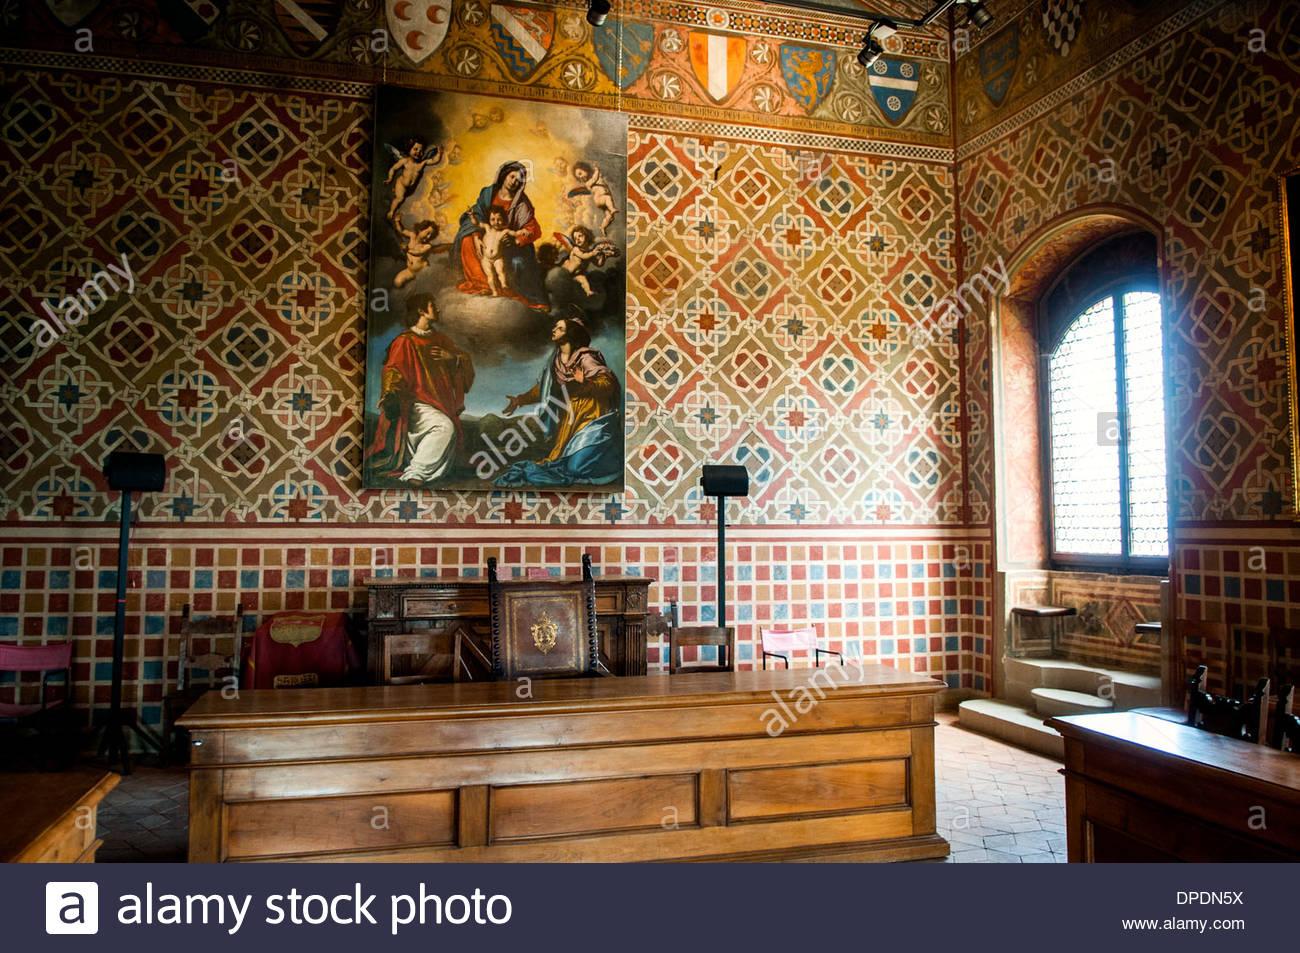 salon of parties,castle of Conti Guidi,poppi,tuscany,italy - Stock Image